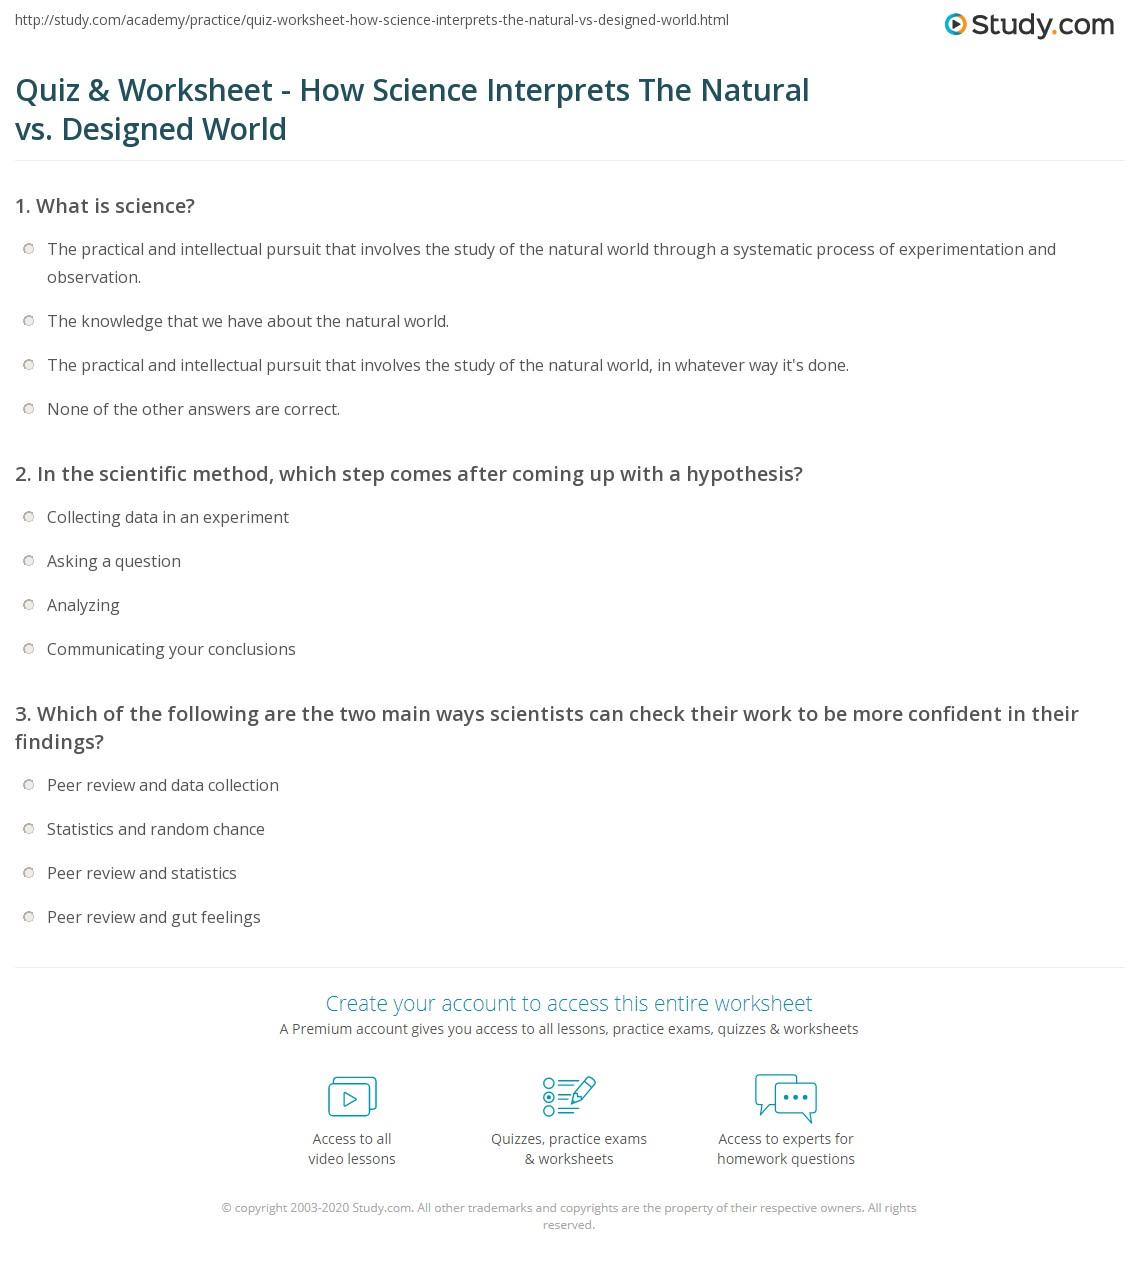 Print How Science Makes Sense Of The Natural Designed World Worksheet